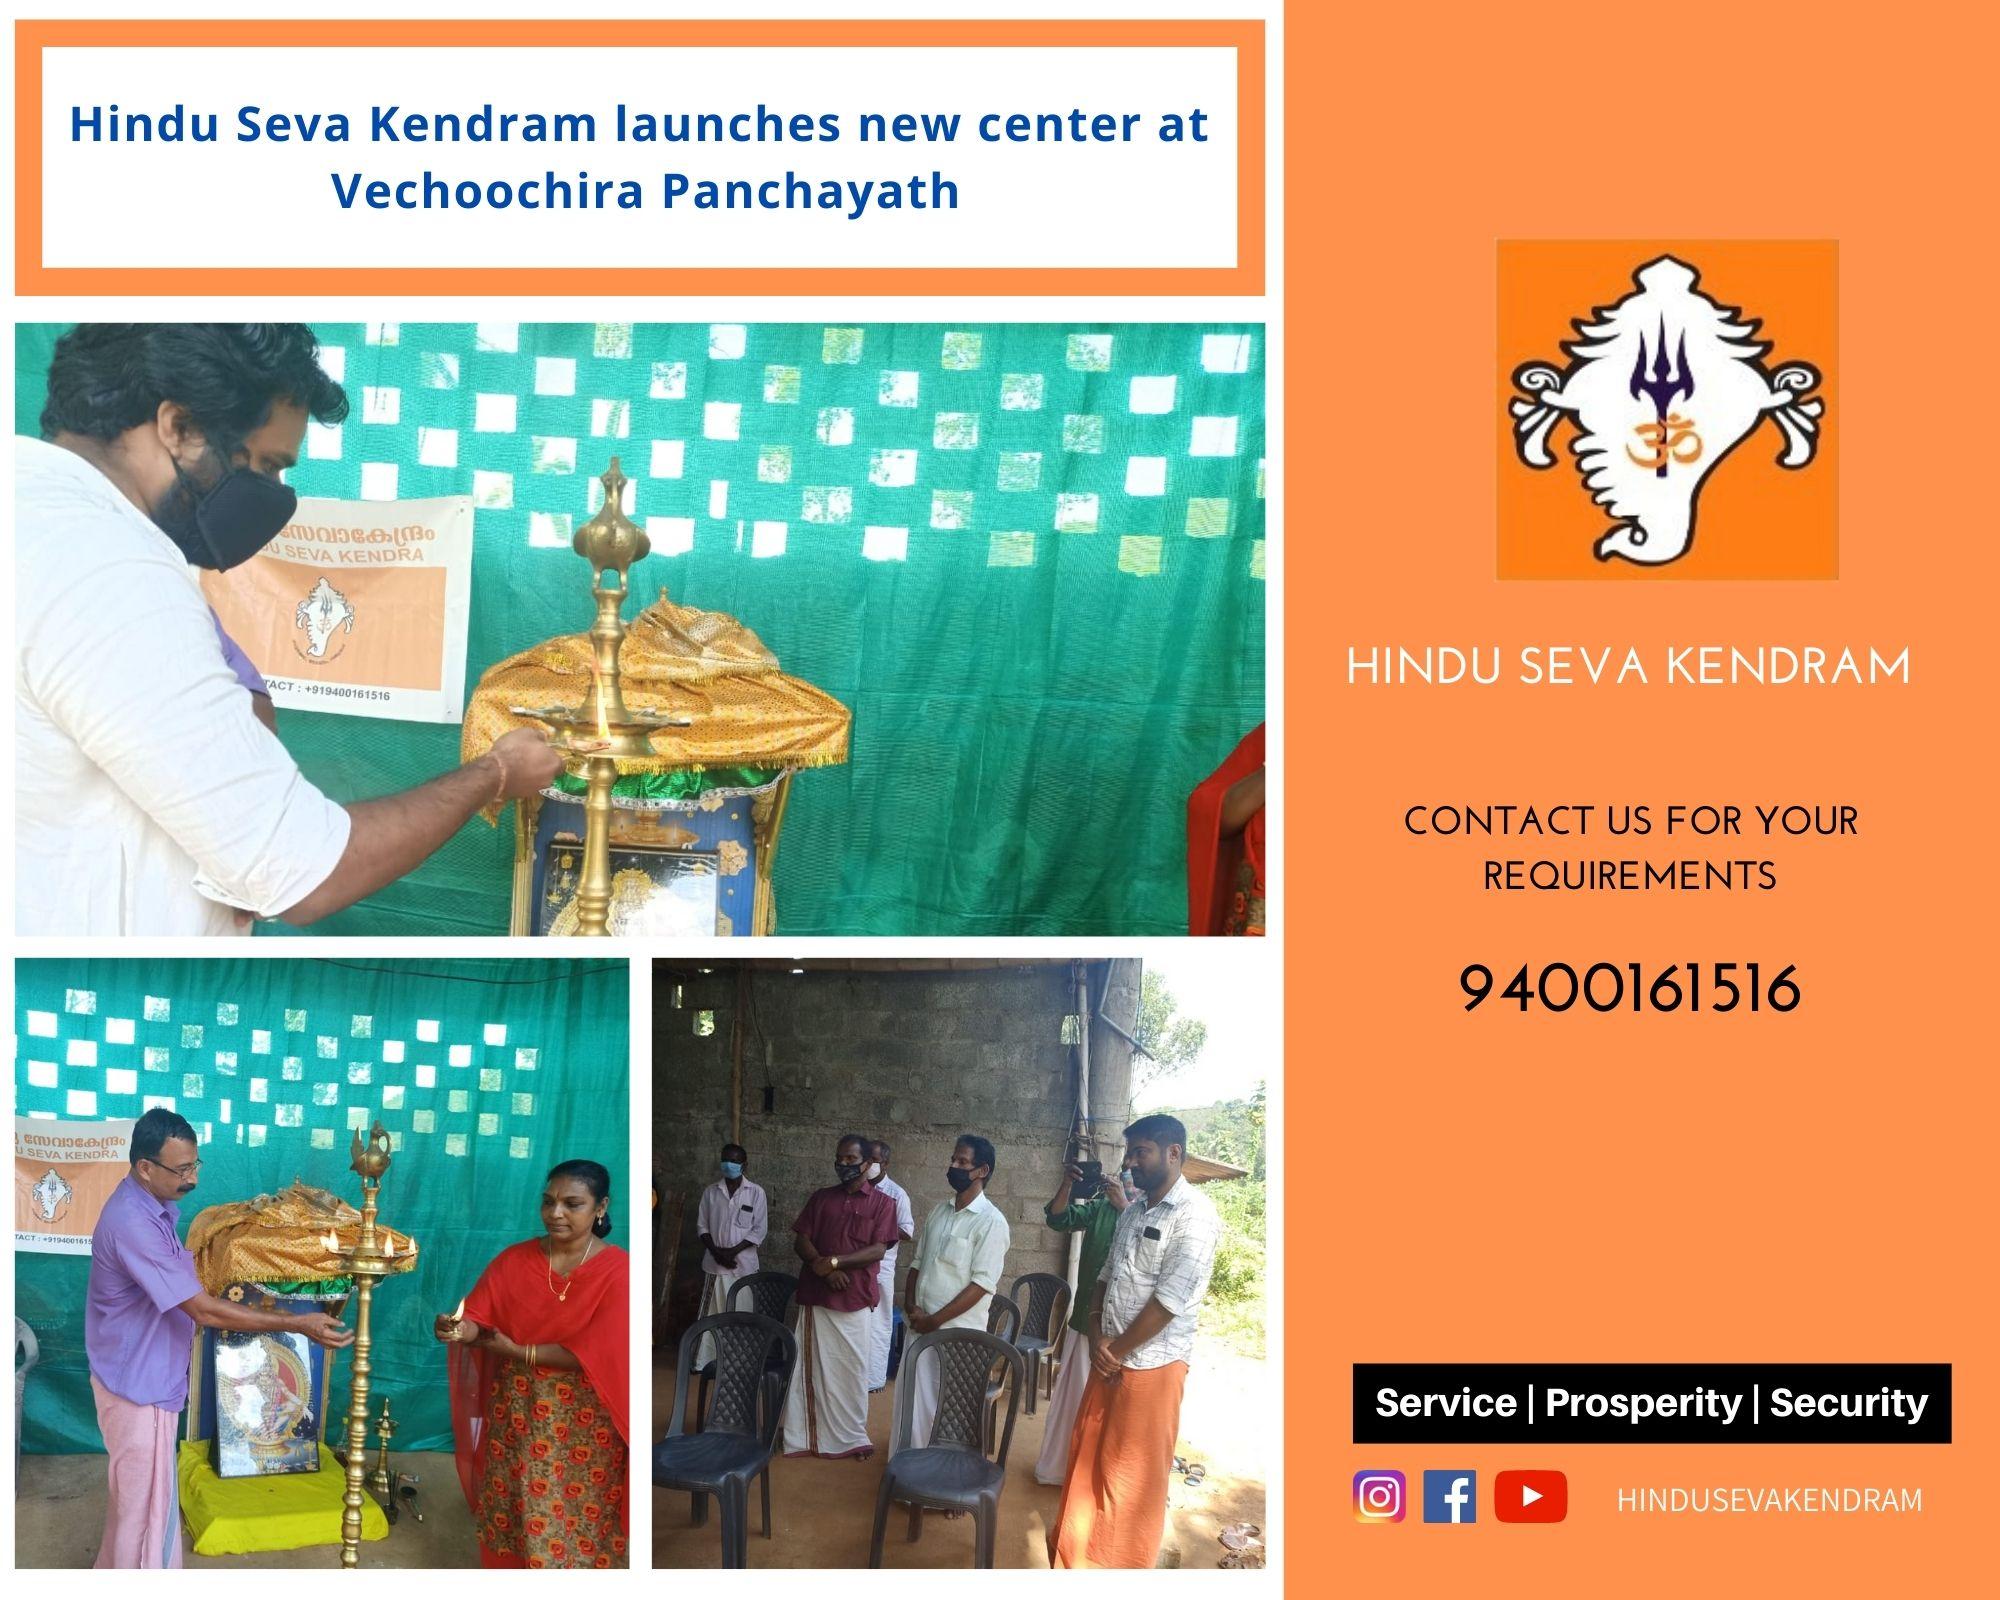 Hindu Seva Kendram launches new center at Vechoochira Panchayath